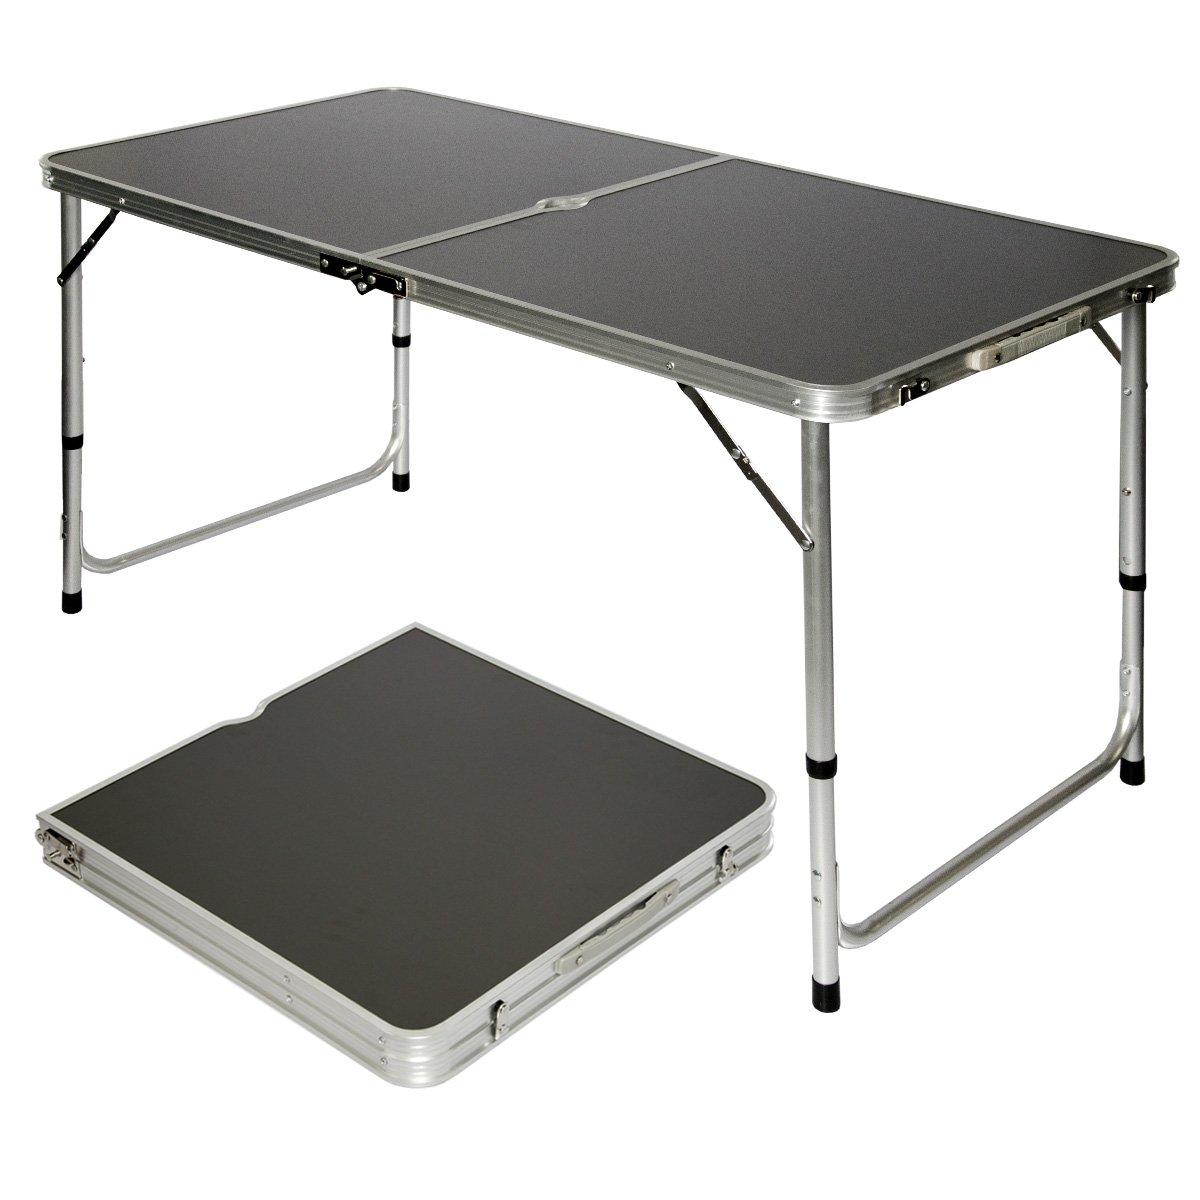 Table Octogonale De Jardin Affordable Table Pliante Nonza X Cm  # Table De Jardin Hexagonale